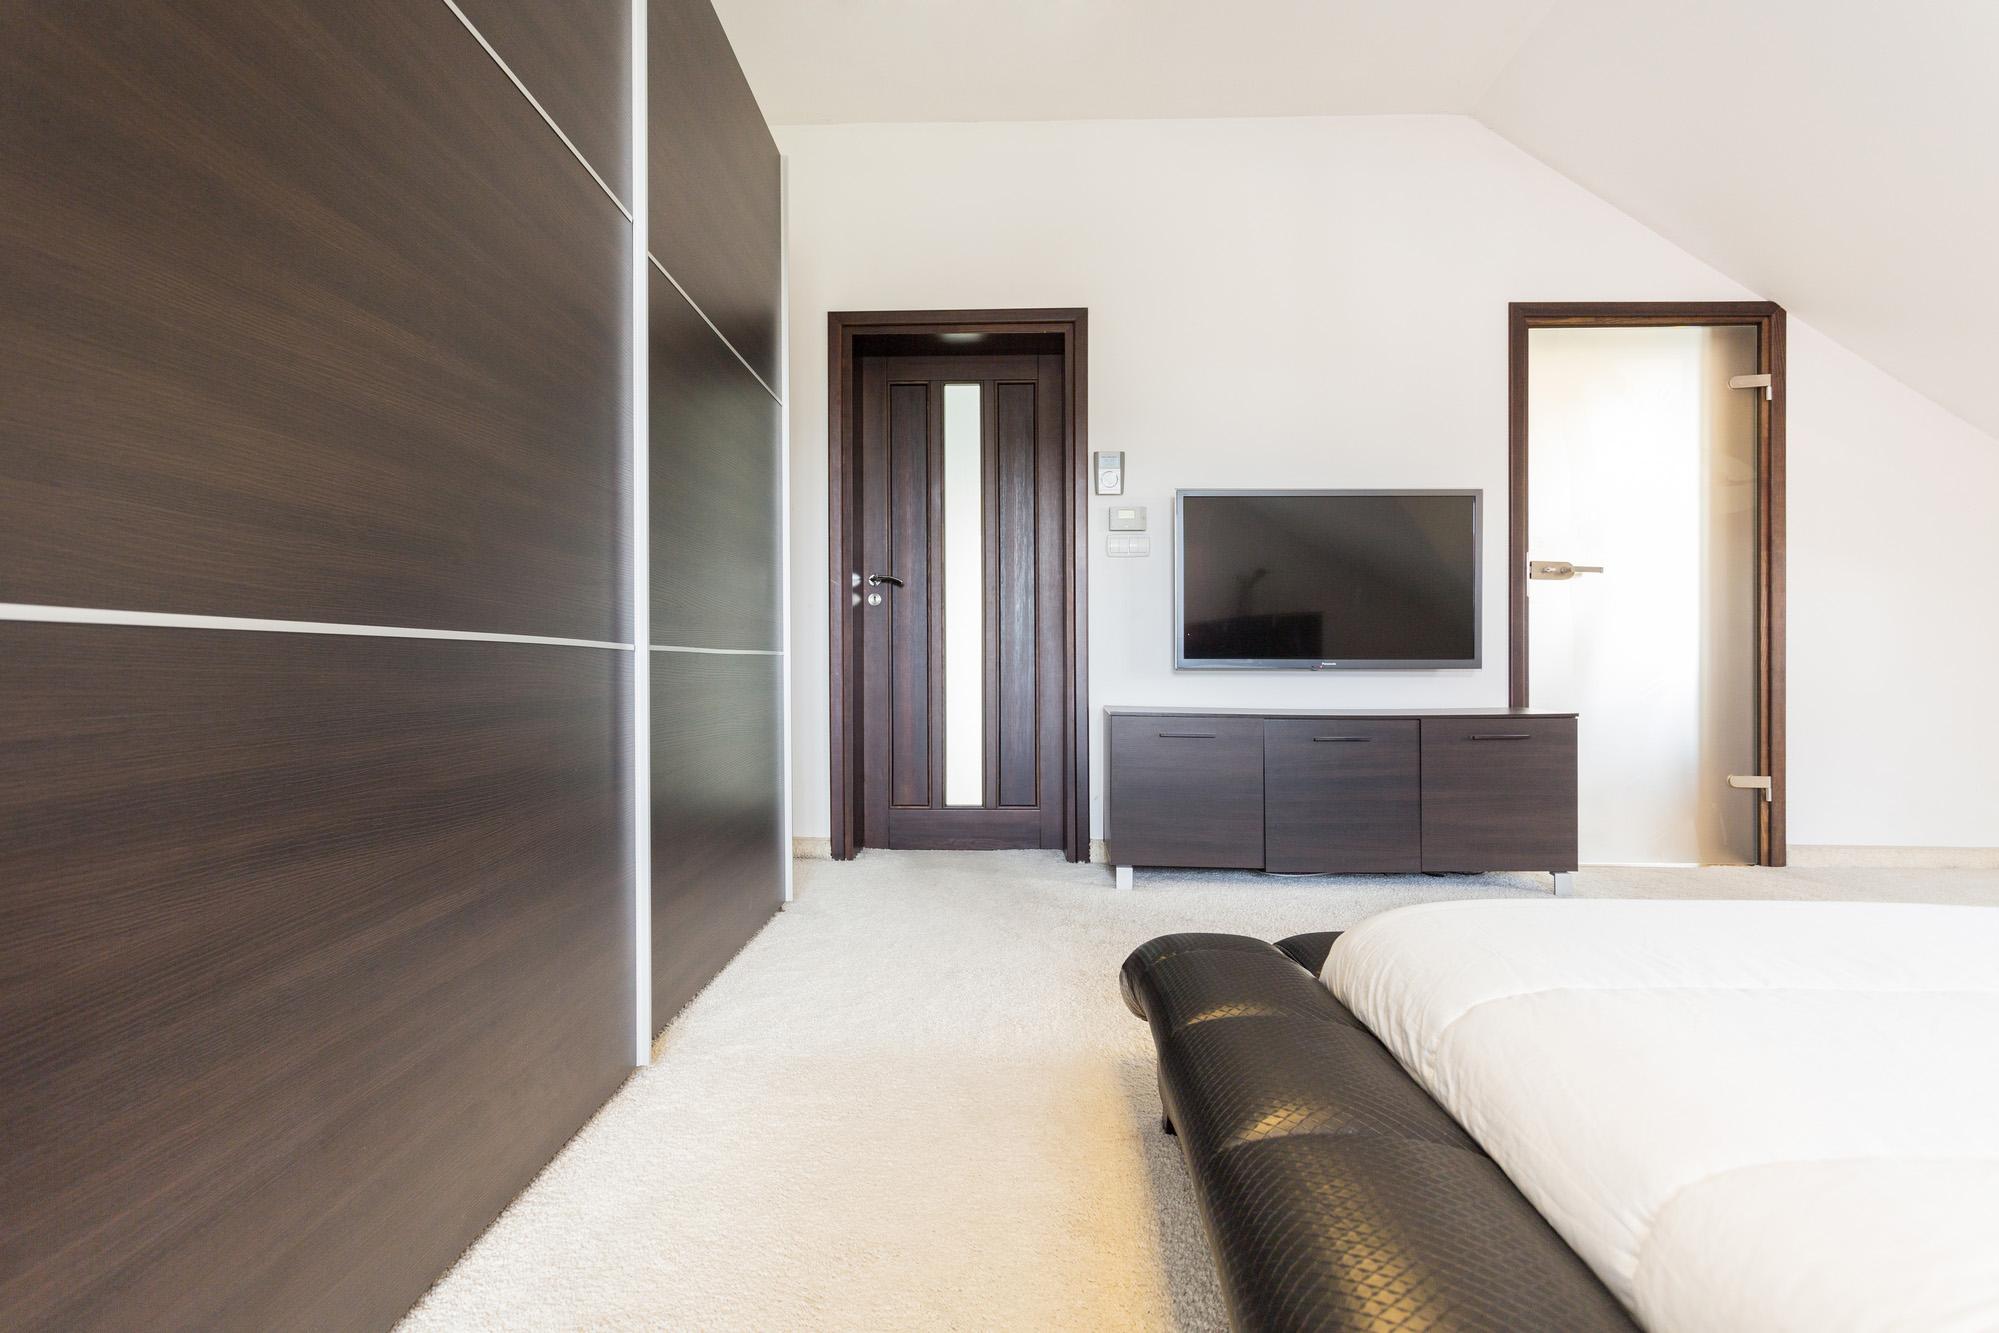 fitted wardrobes sliding doors, wardrobe design